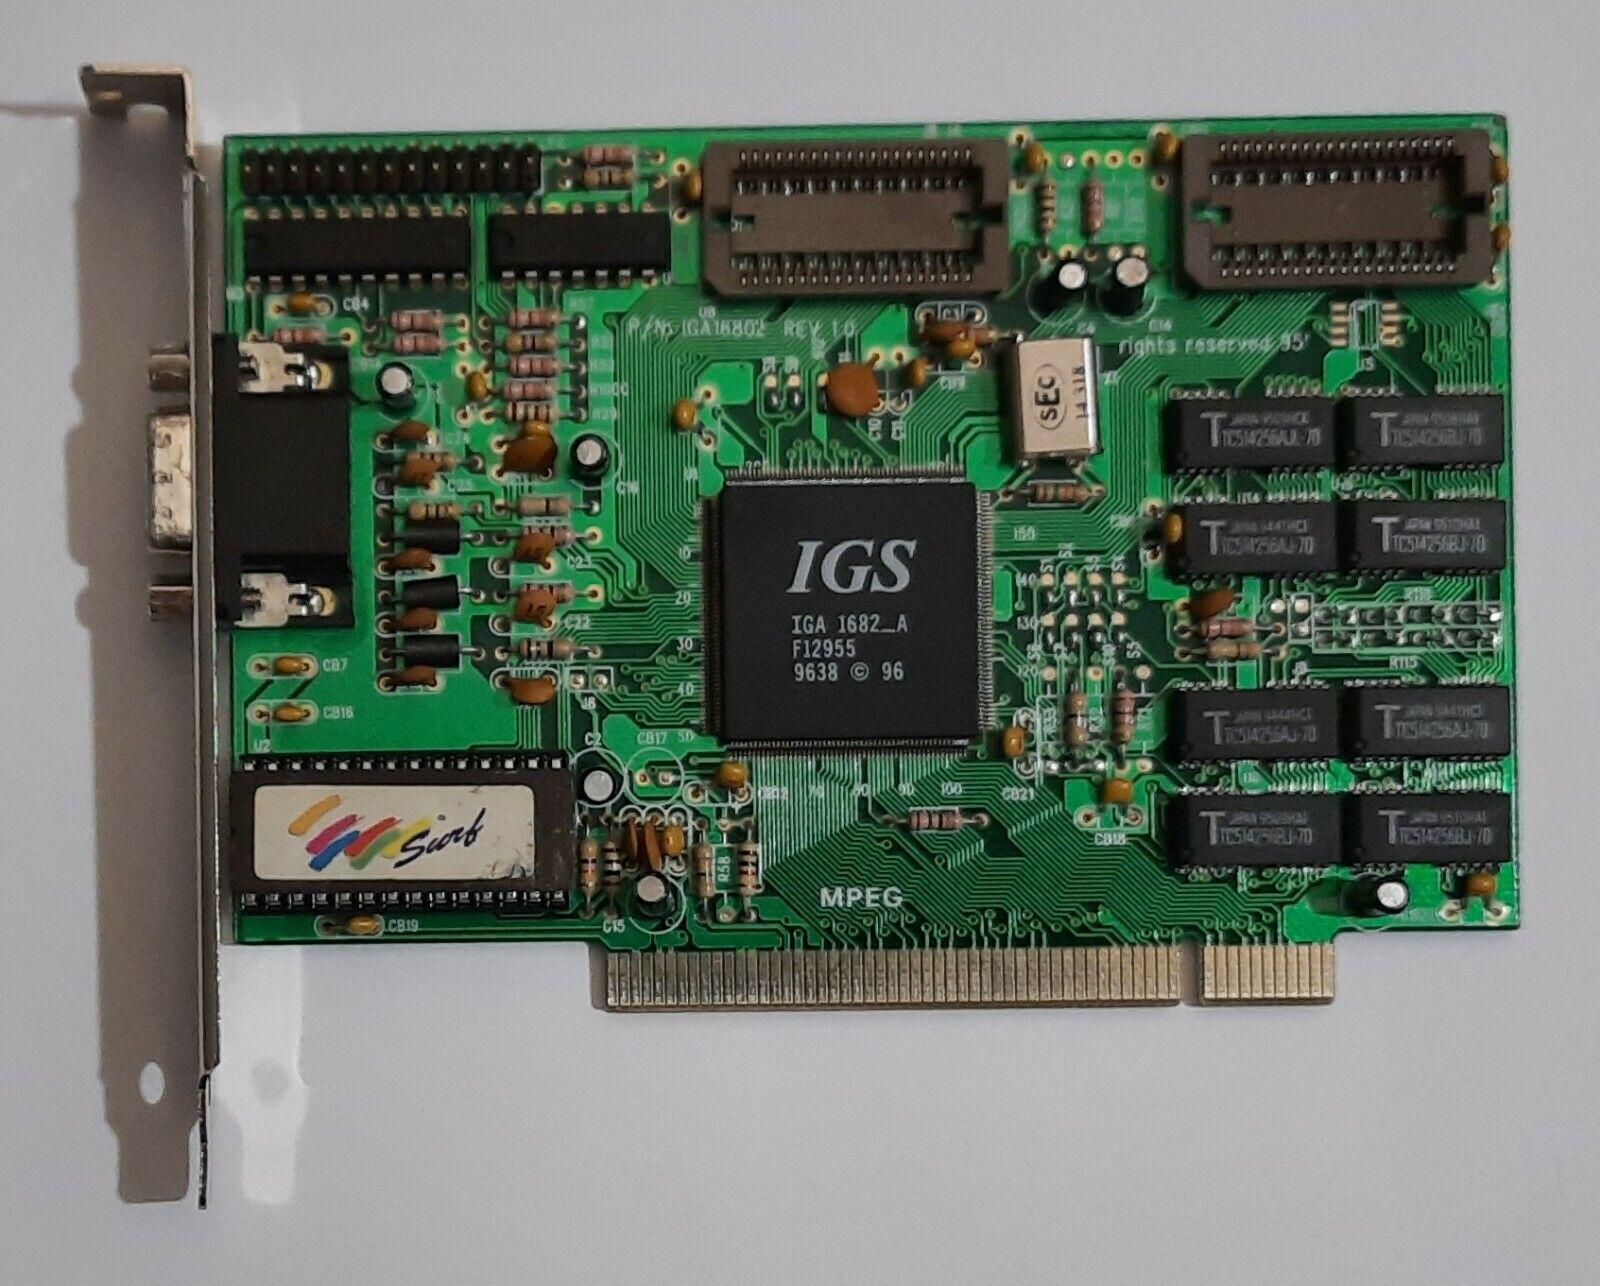 Surf Multimedia (?) IGA16802 PCI Grafikkarte (IGS IGA 1682_A, 1MB, 1996)